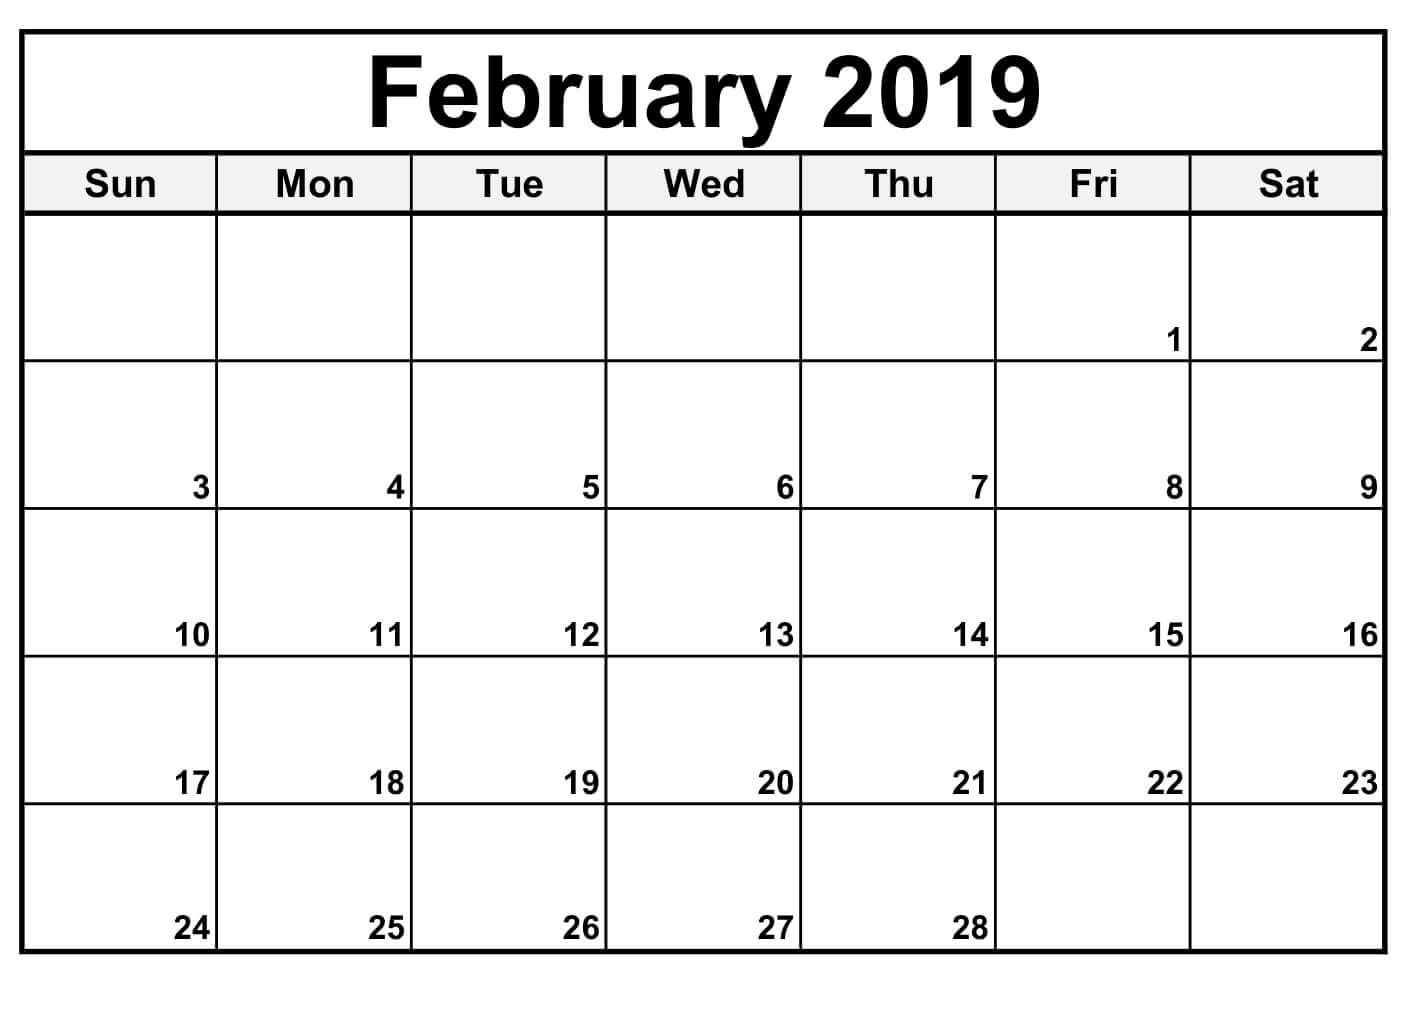 February 2019 Calendar Editable | Free Printable February 2019 pertaining to Free Fillable Blank Calendar Templates